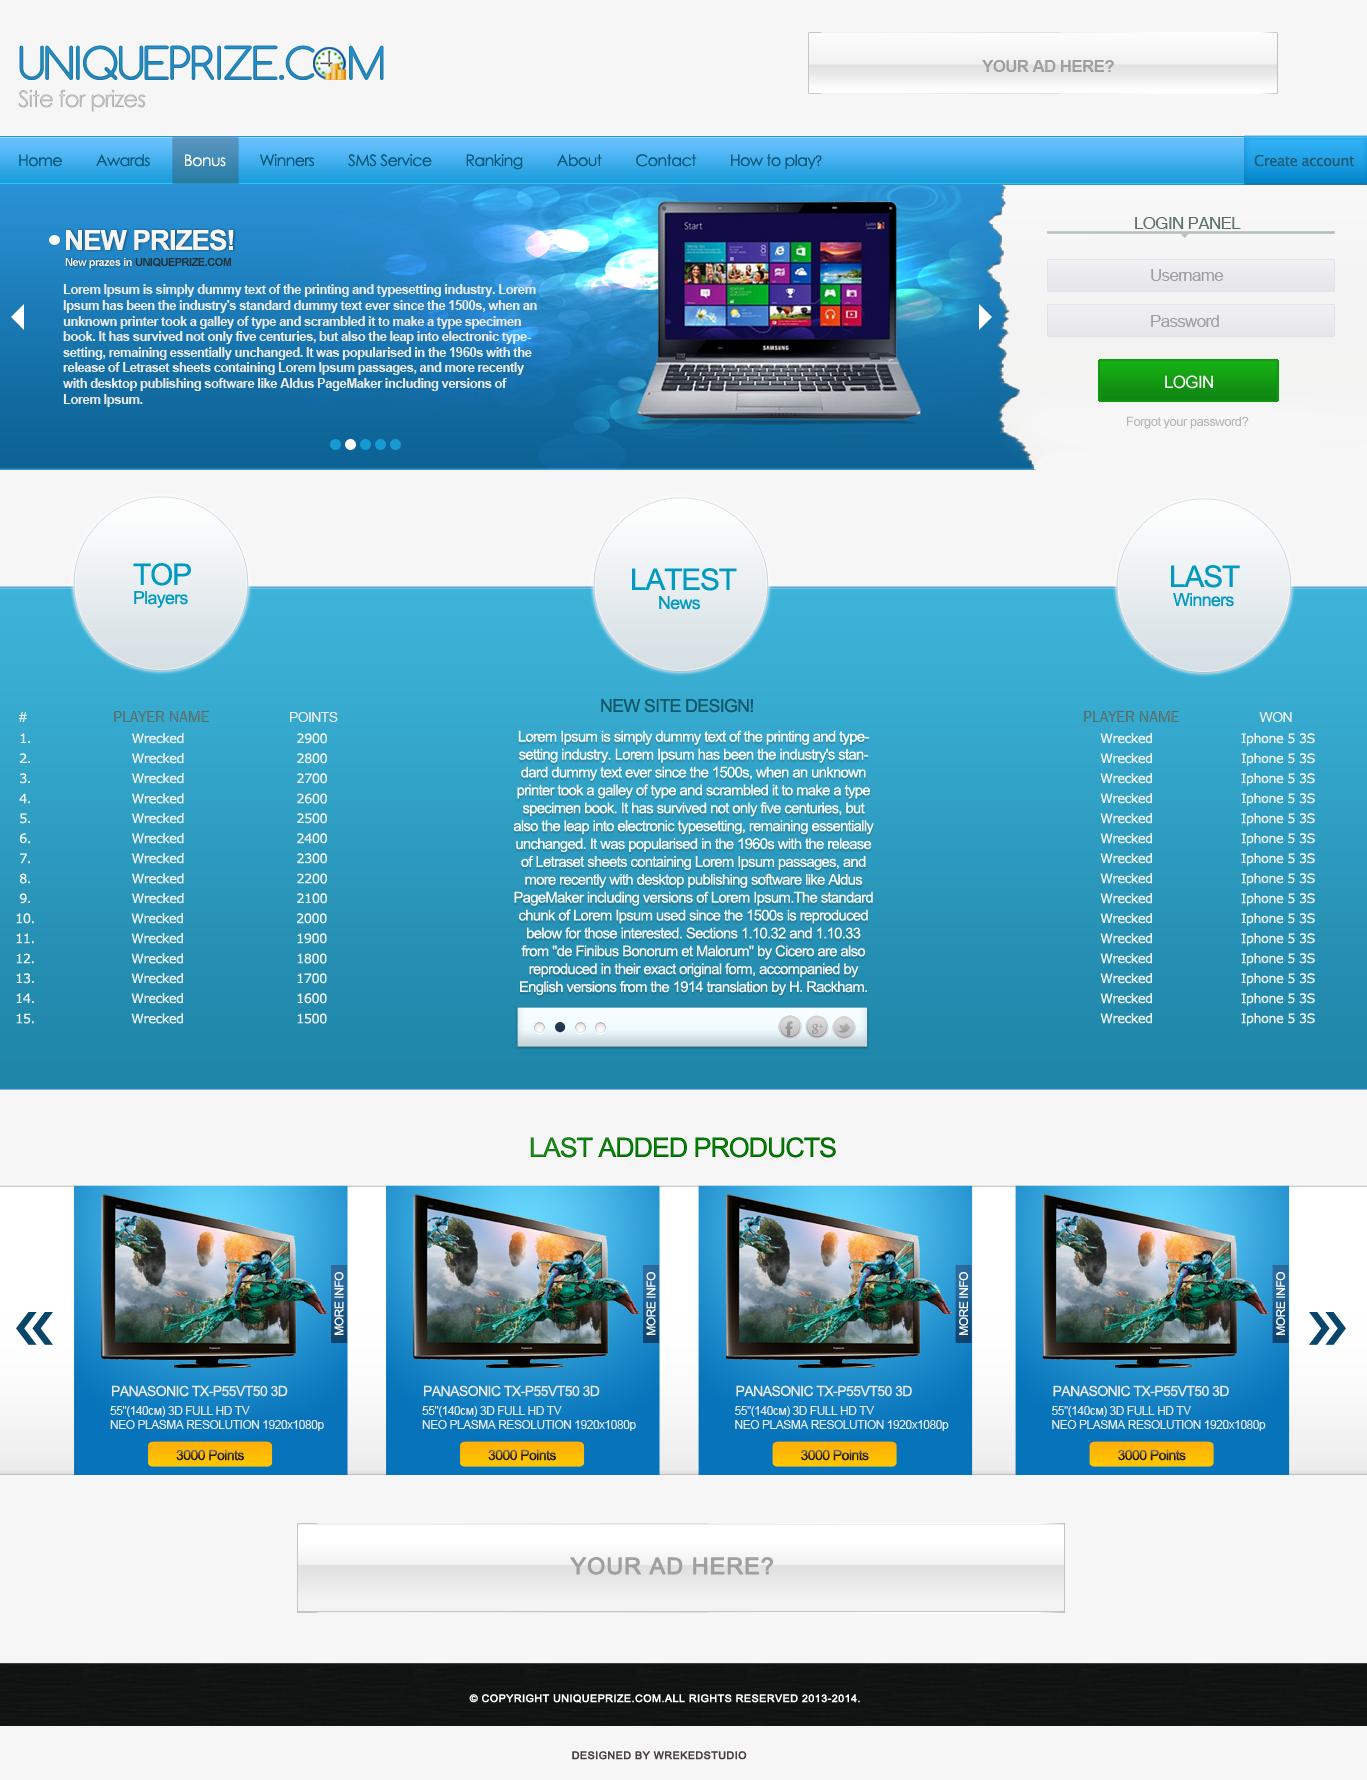 UNIQUEPRIZE.COM - Site for prizes [Web Design] by mconev